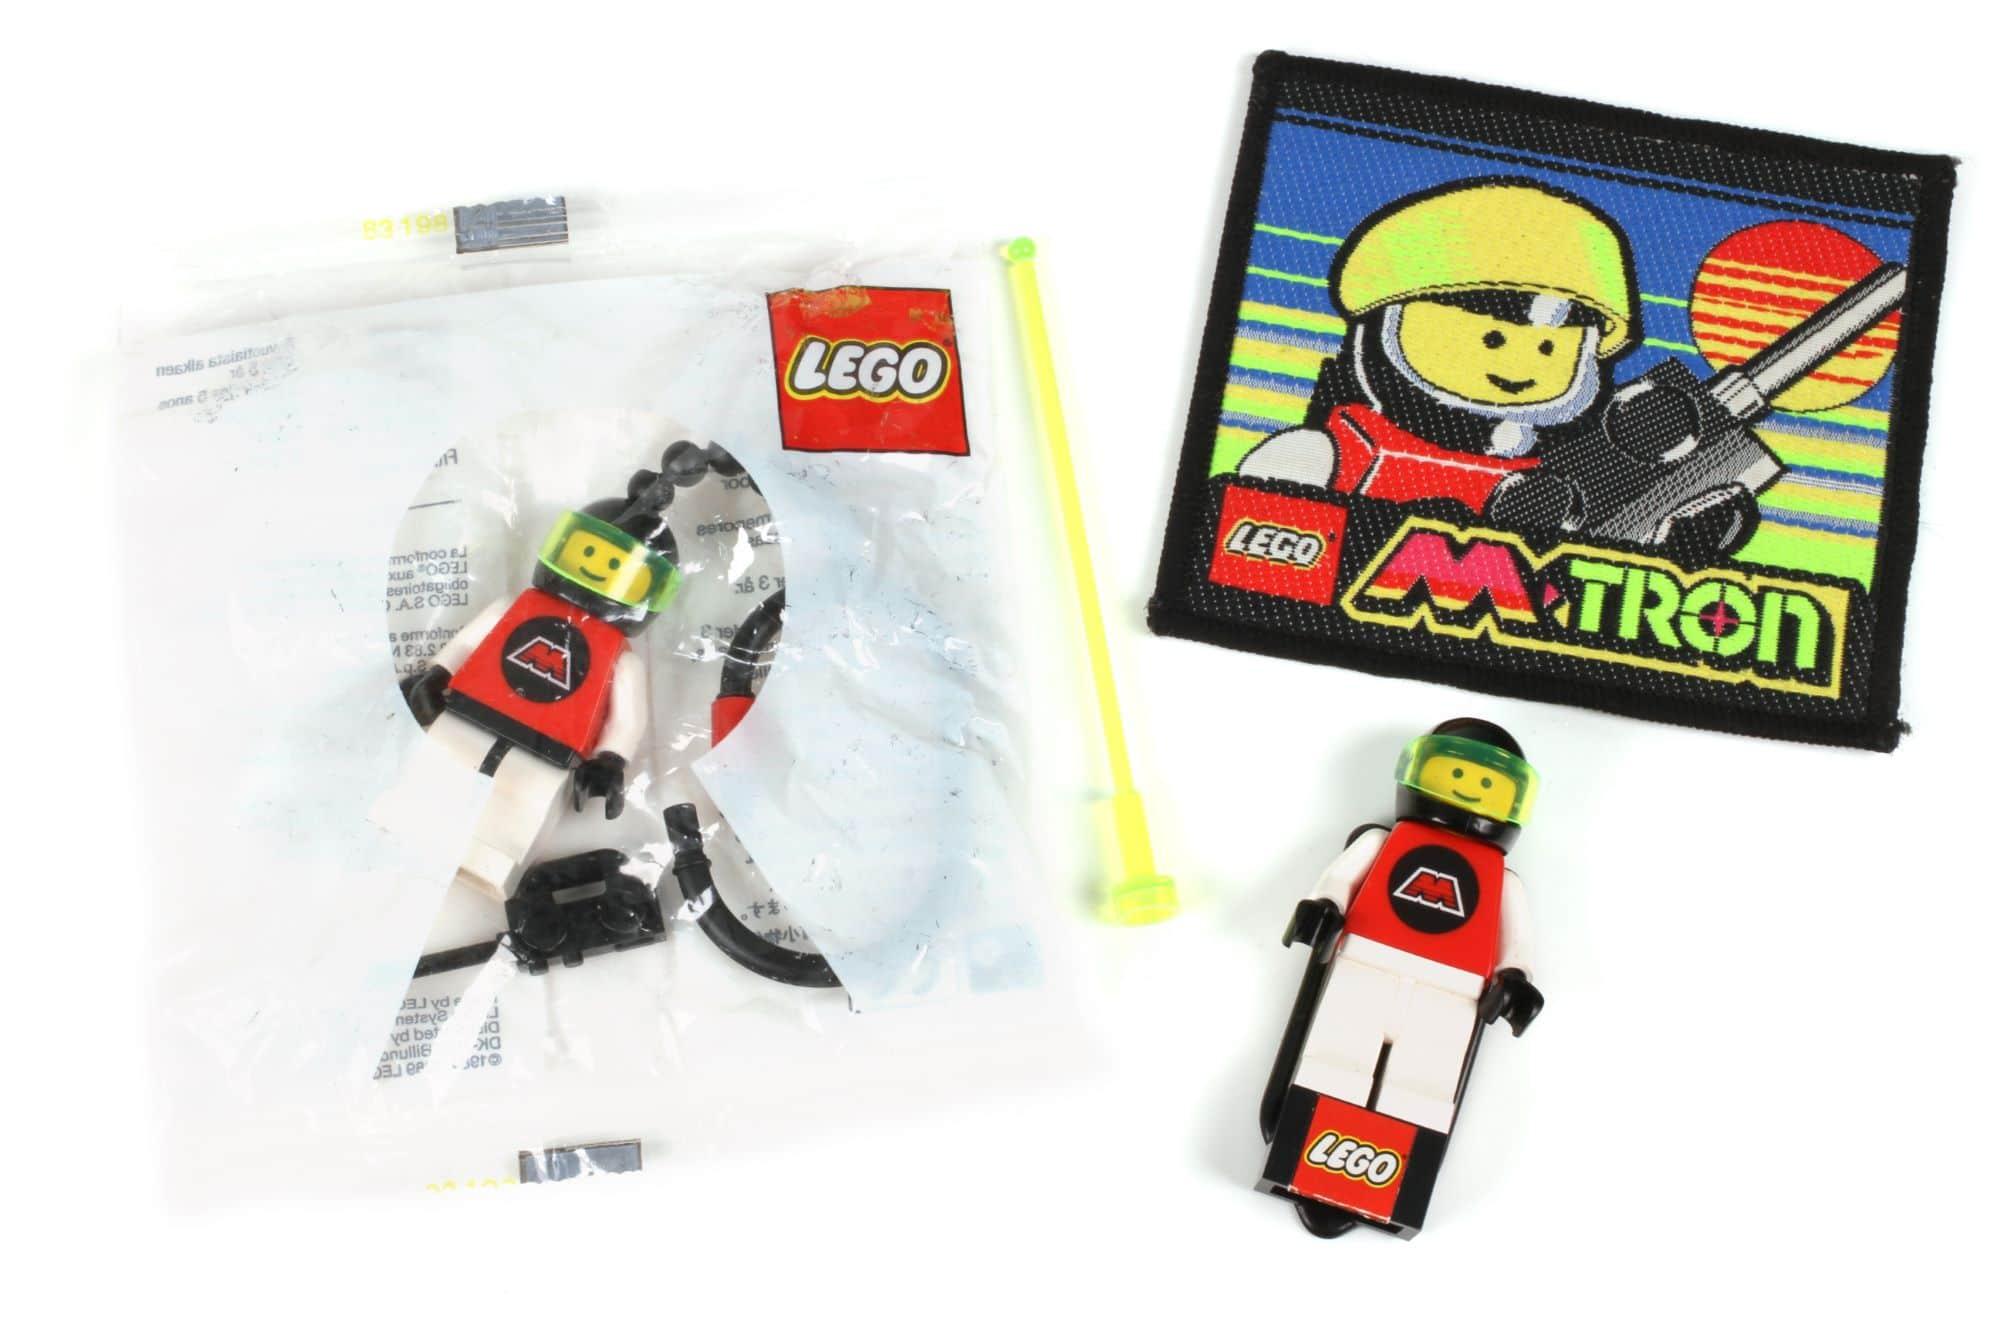 LEGO M Tron Merchandise